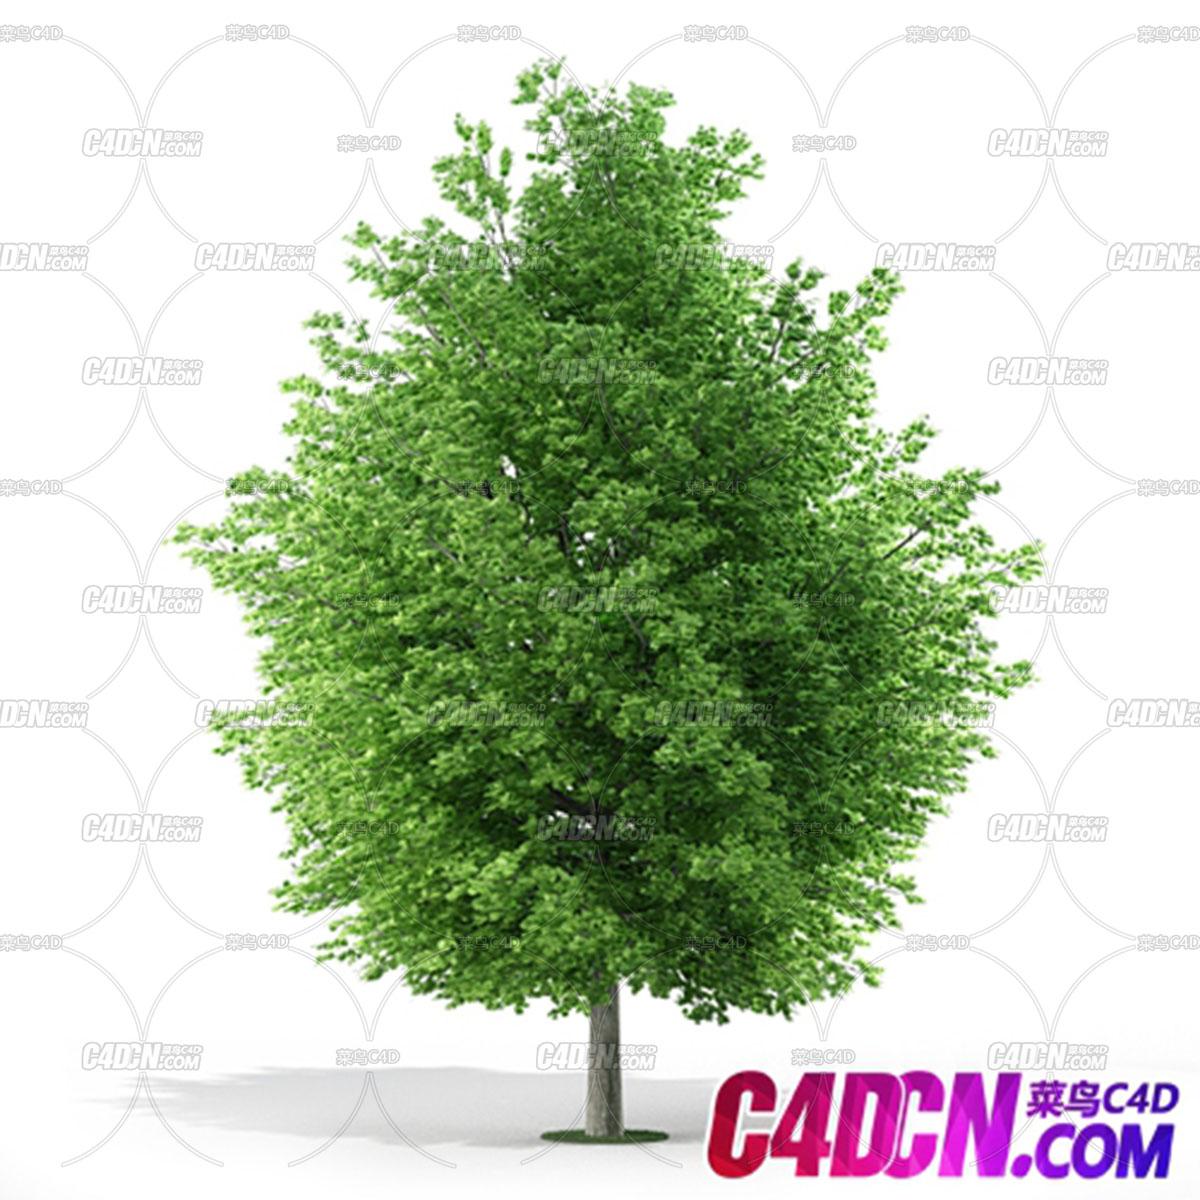 C4D模型 阔叶树木植物模型 C4D model broadleaf tree plant model